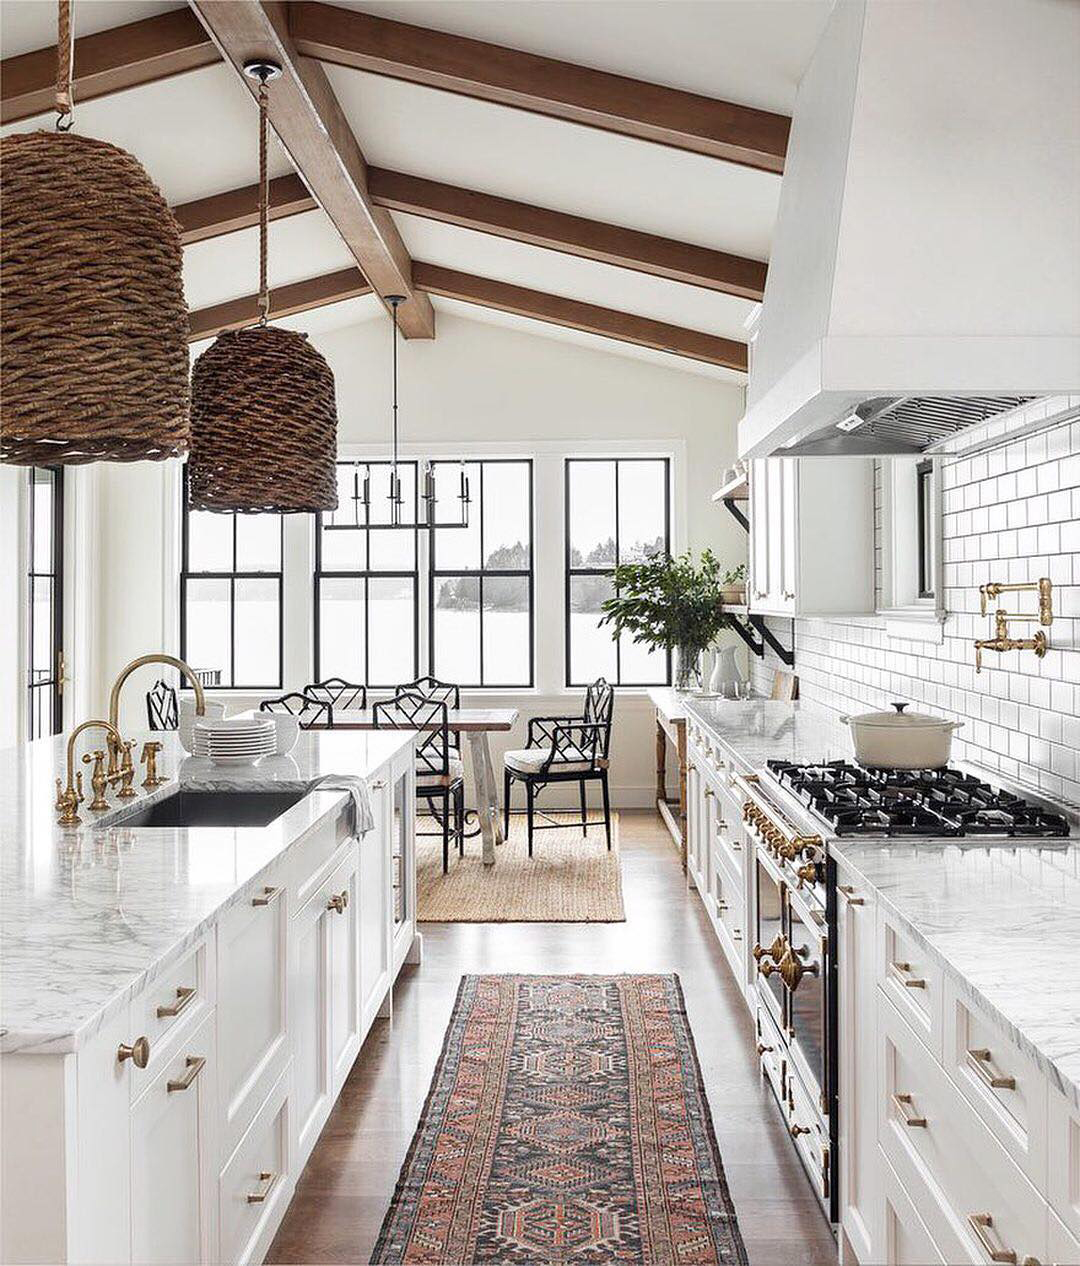 Studio McGee Kitchen Design